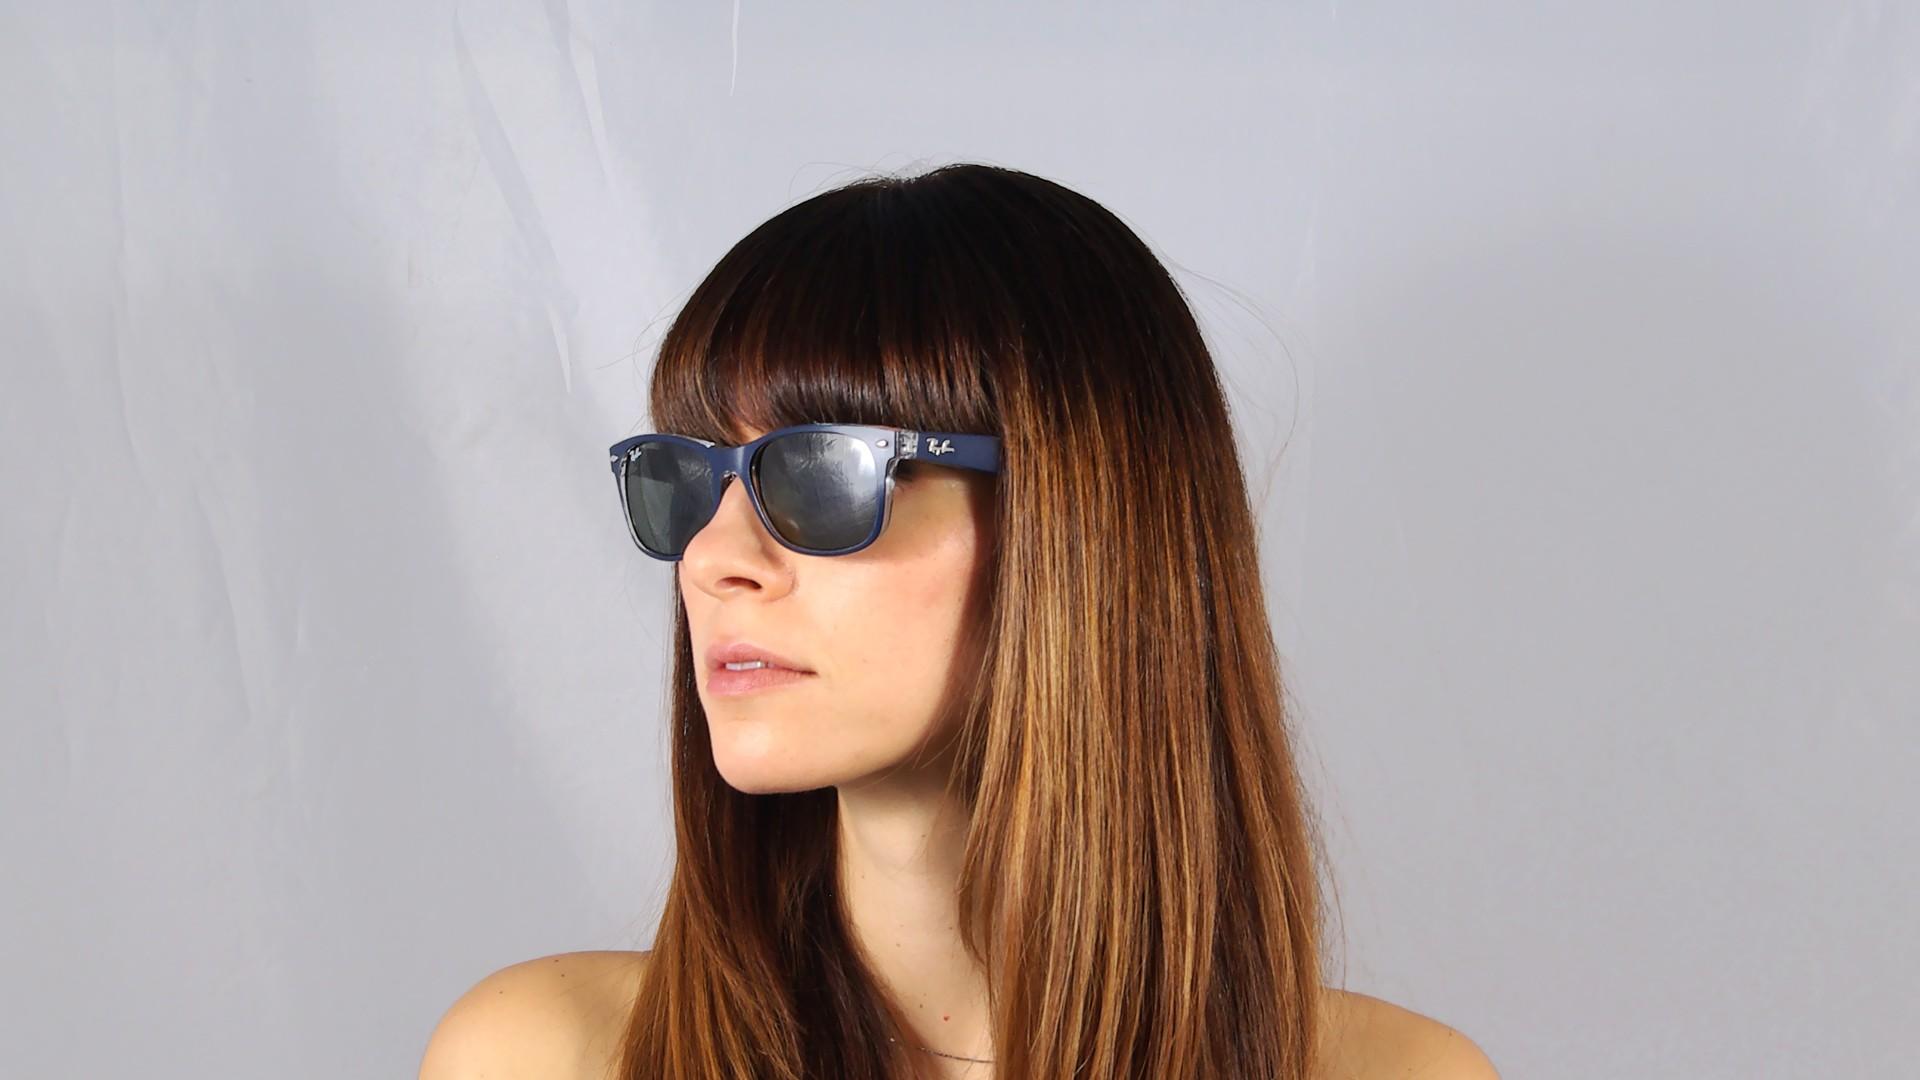 Sunglasses Ray-Ban New Wayfarer Blue RB2132 6188 55-18 Large 7526633a3b